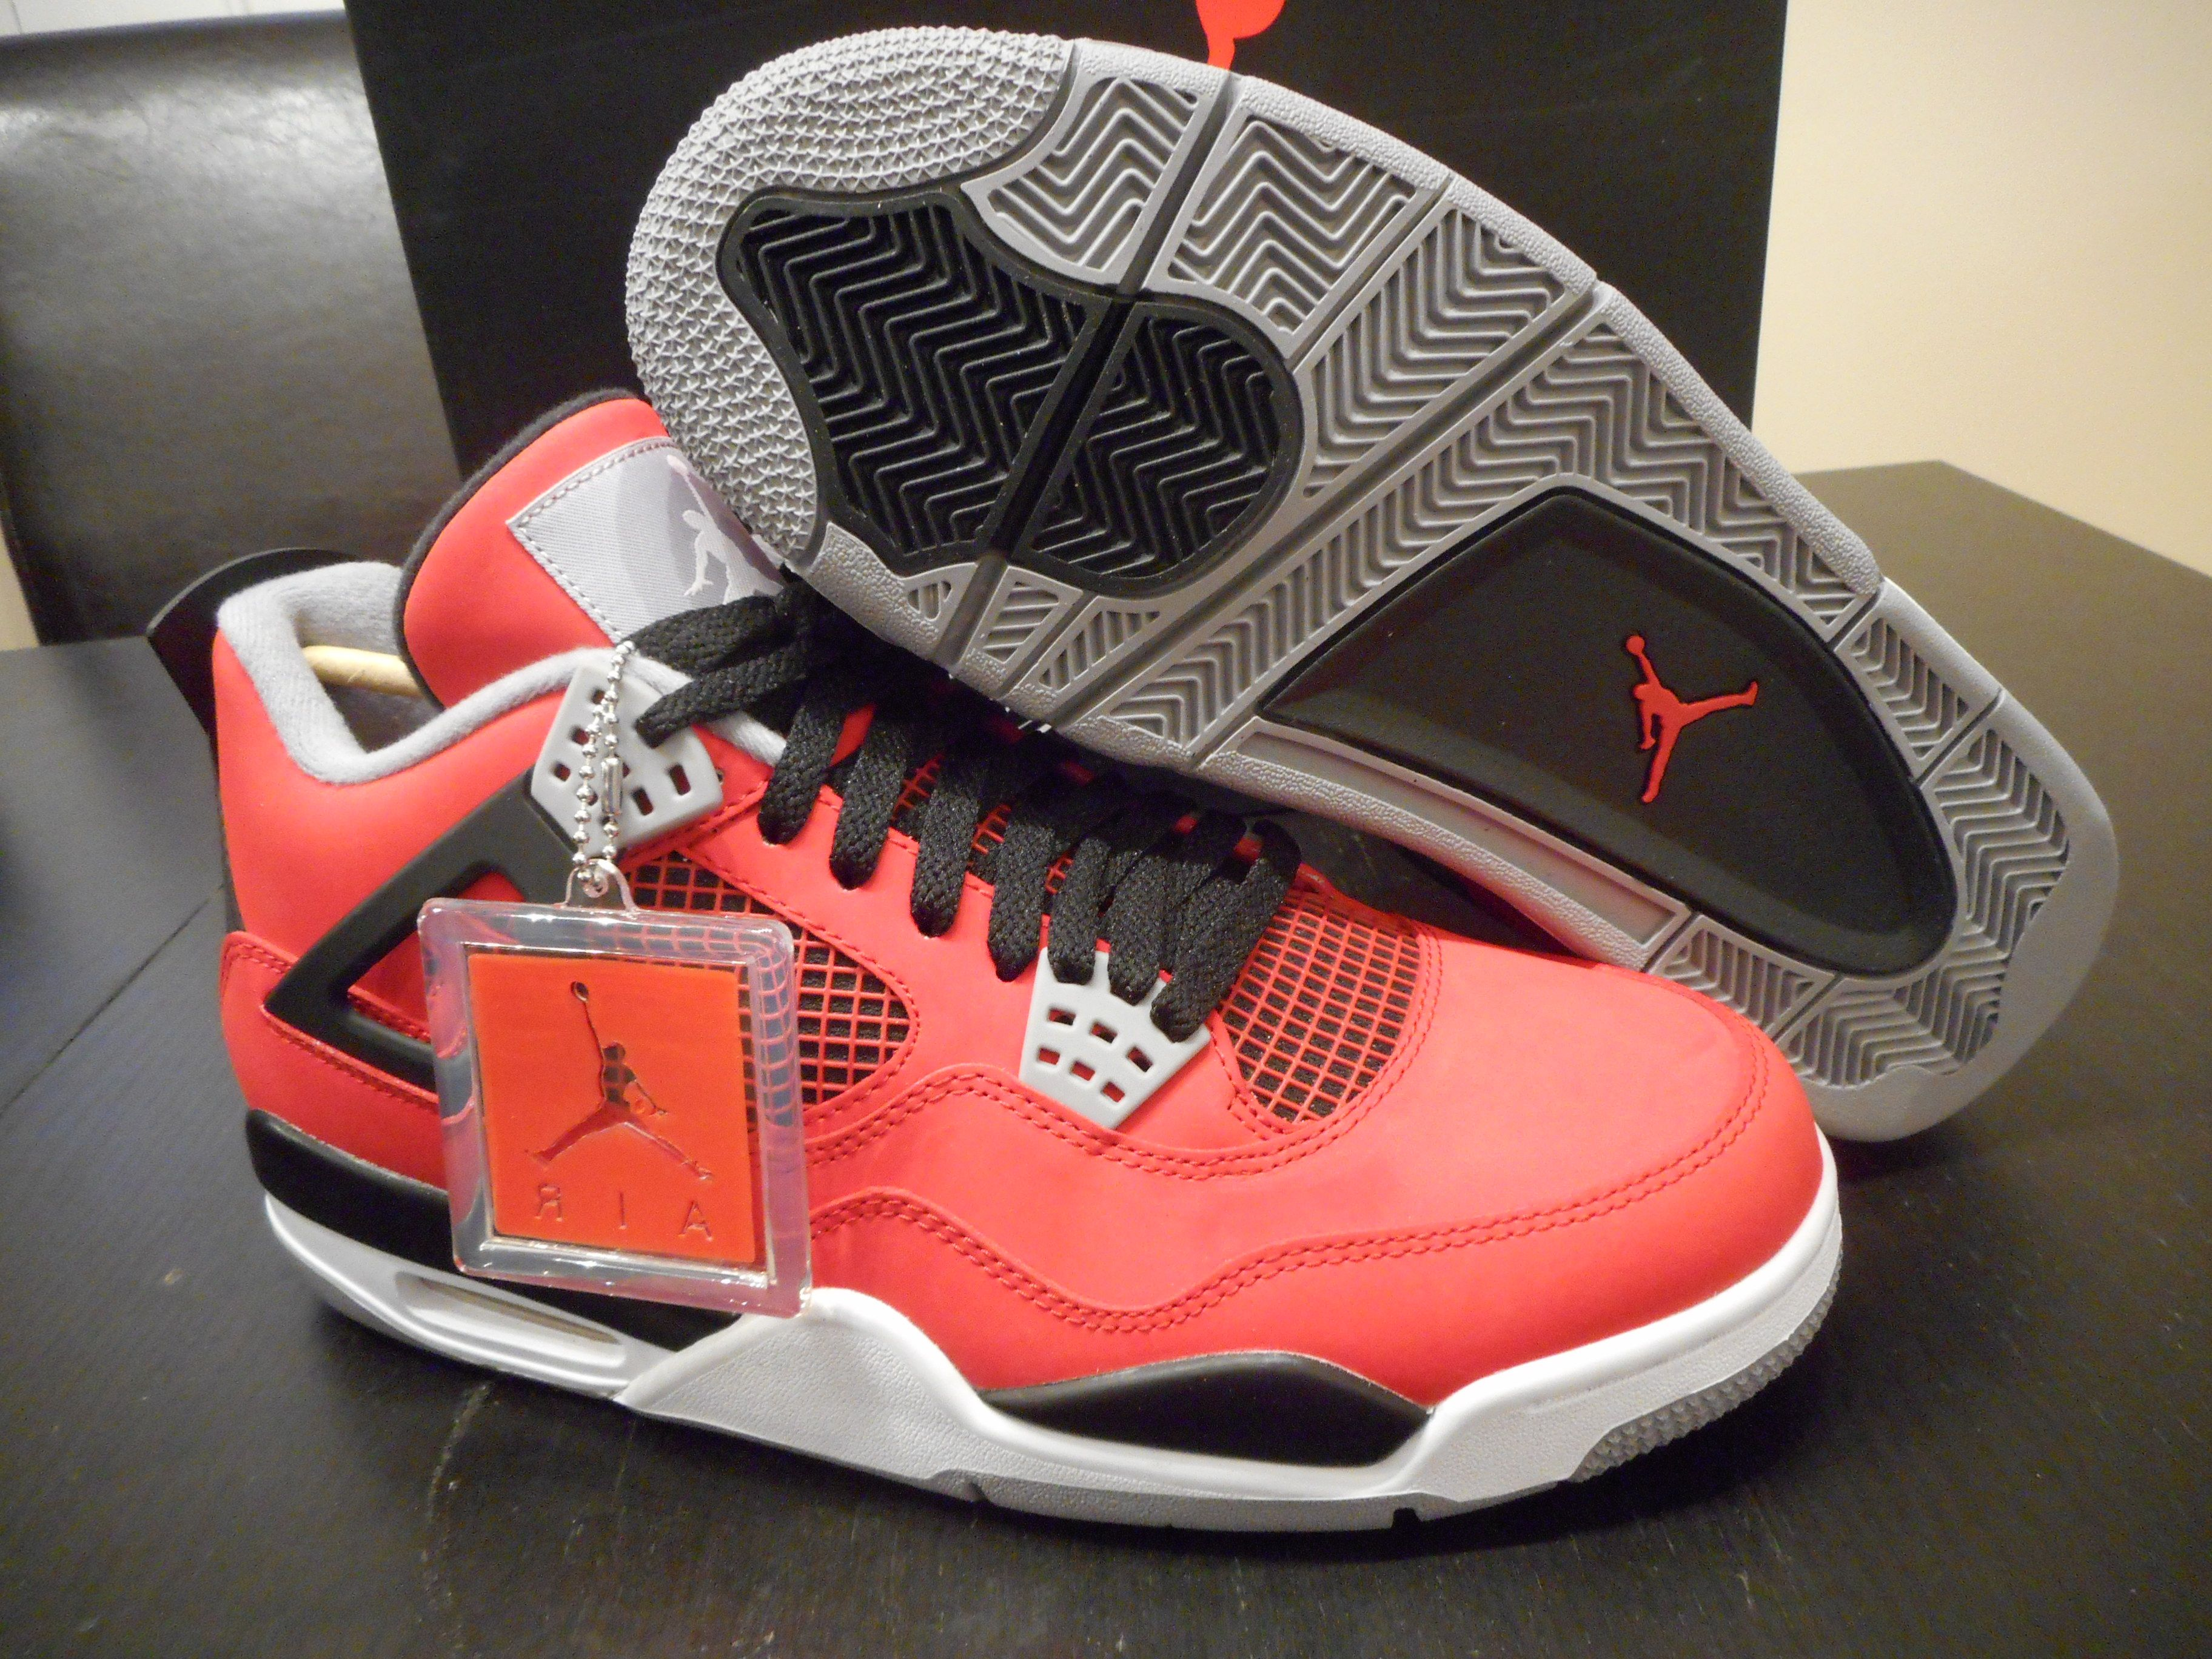 100% authentic 7cddb 71545 Brand New Authentic Nike Air Jordan 4 IV Toro Bravo Mens Shoe Size 10 US.